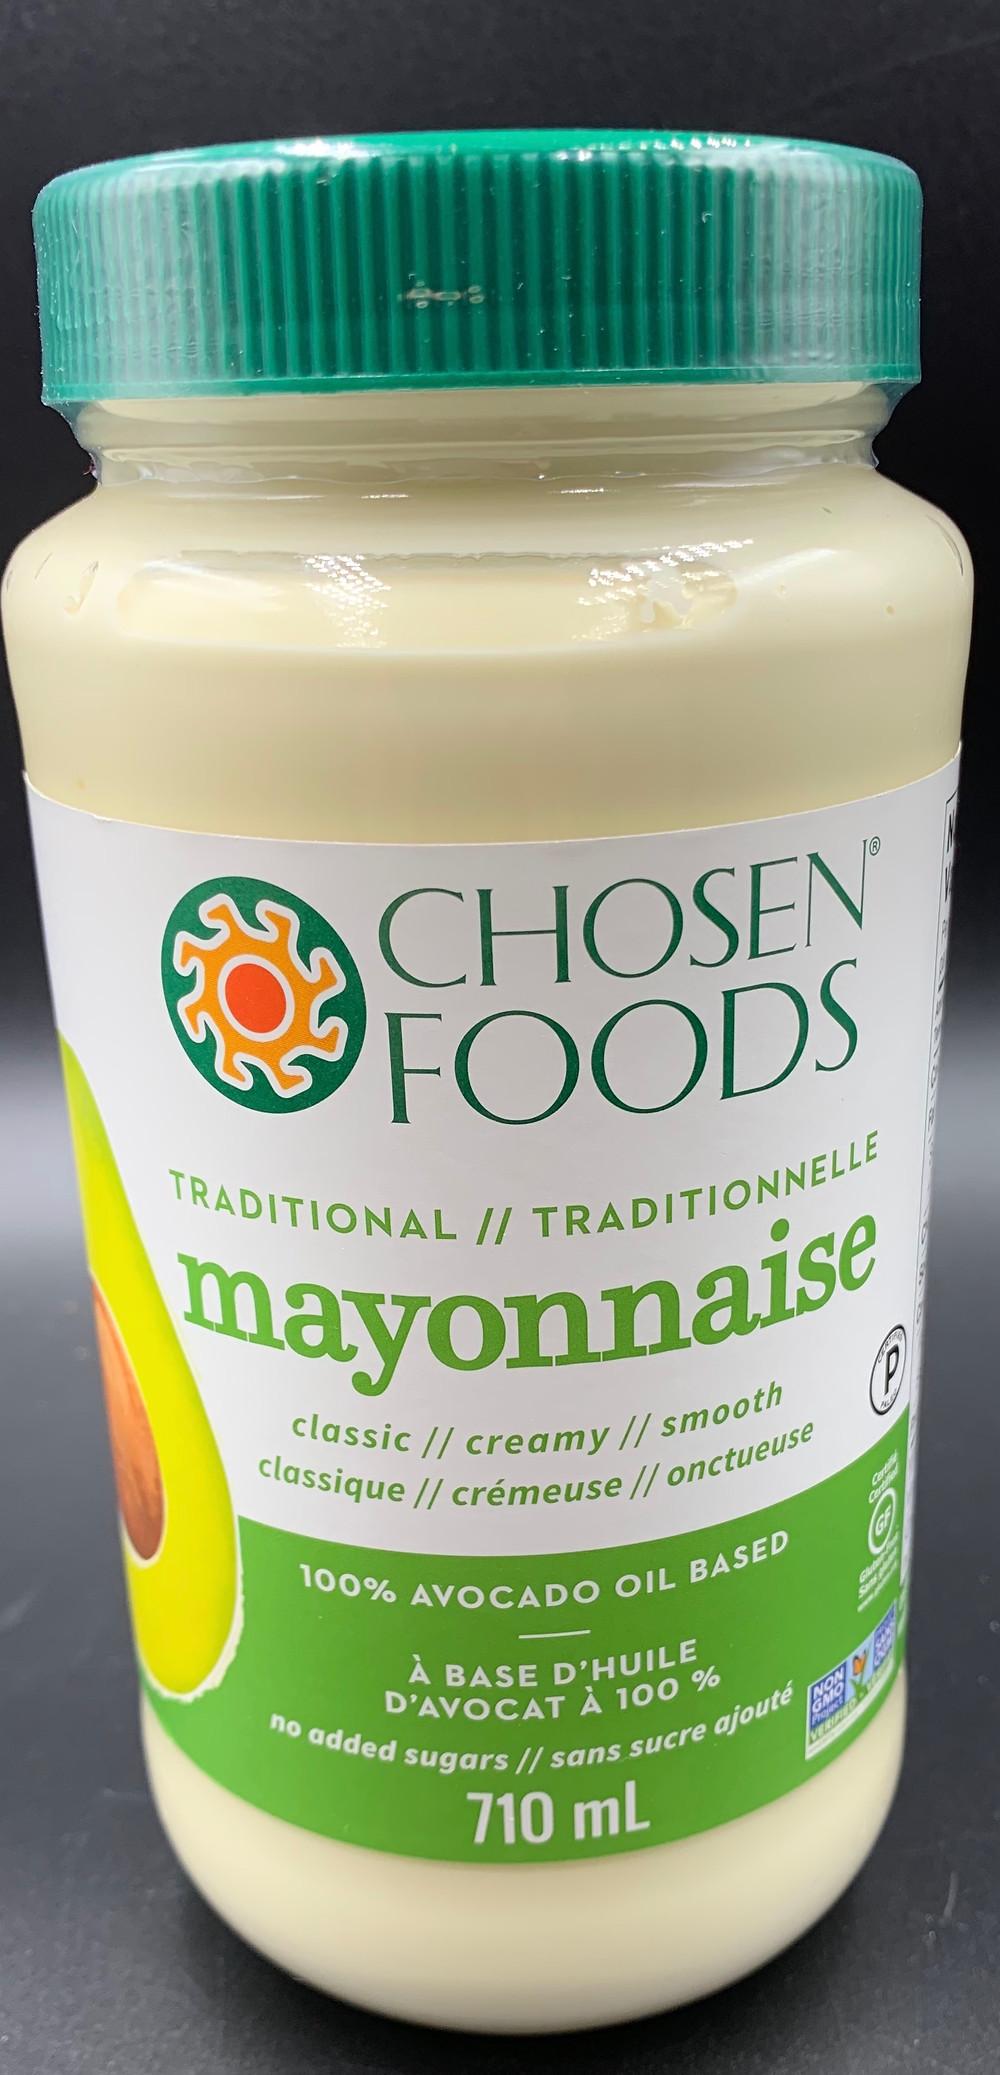 Costco Chosen Foods Avocado Mayonnaise